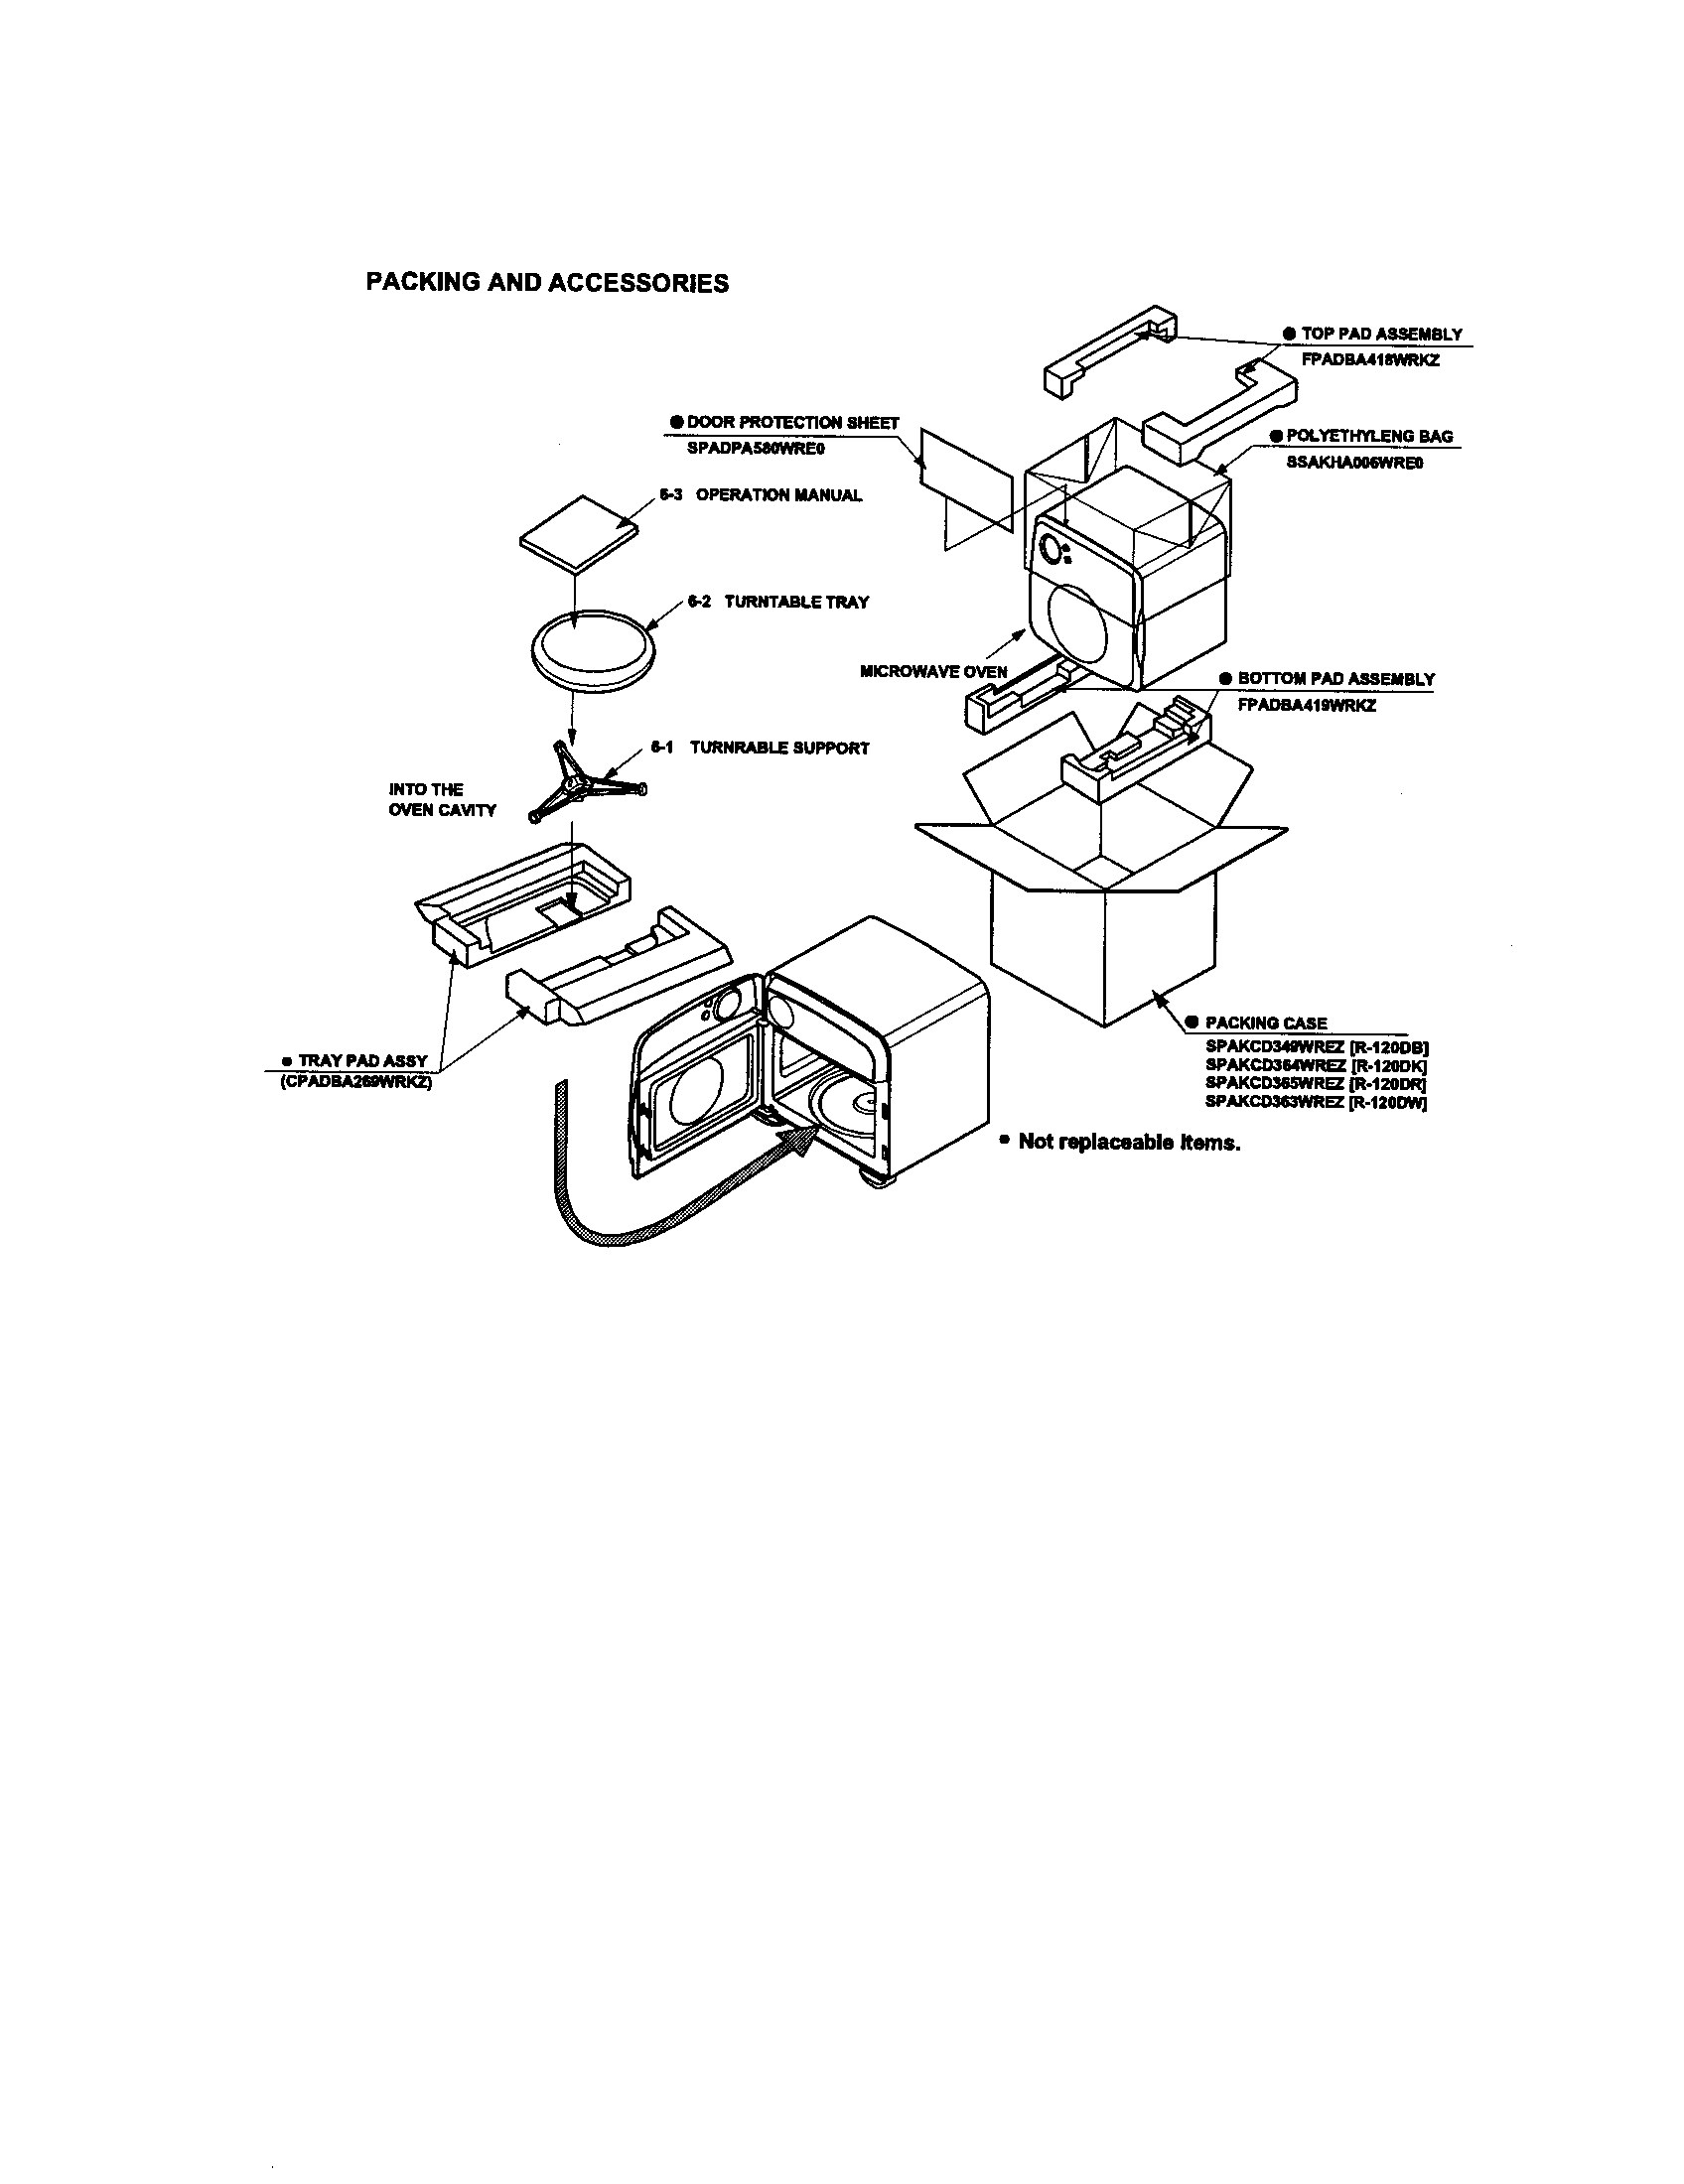 Sharp model R-120DK countertop microwave genuine parts